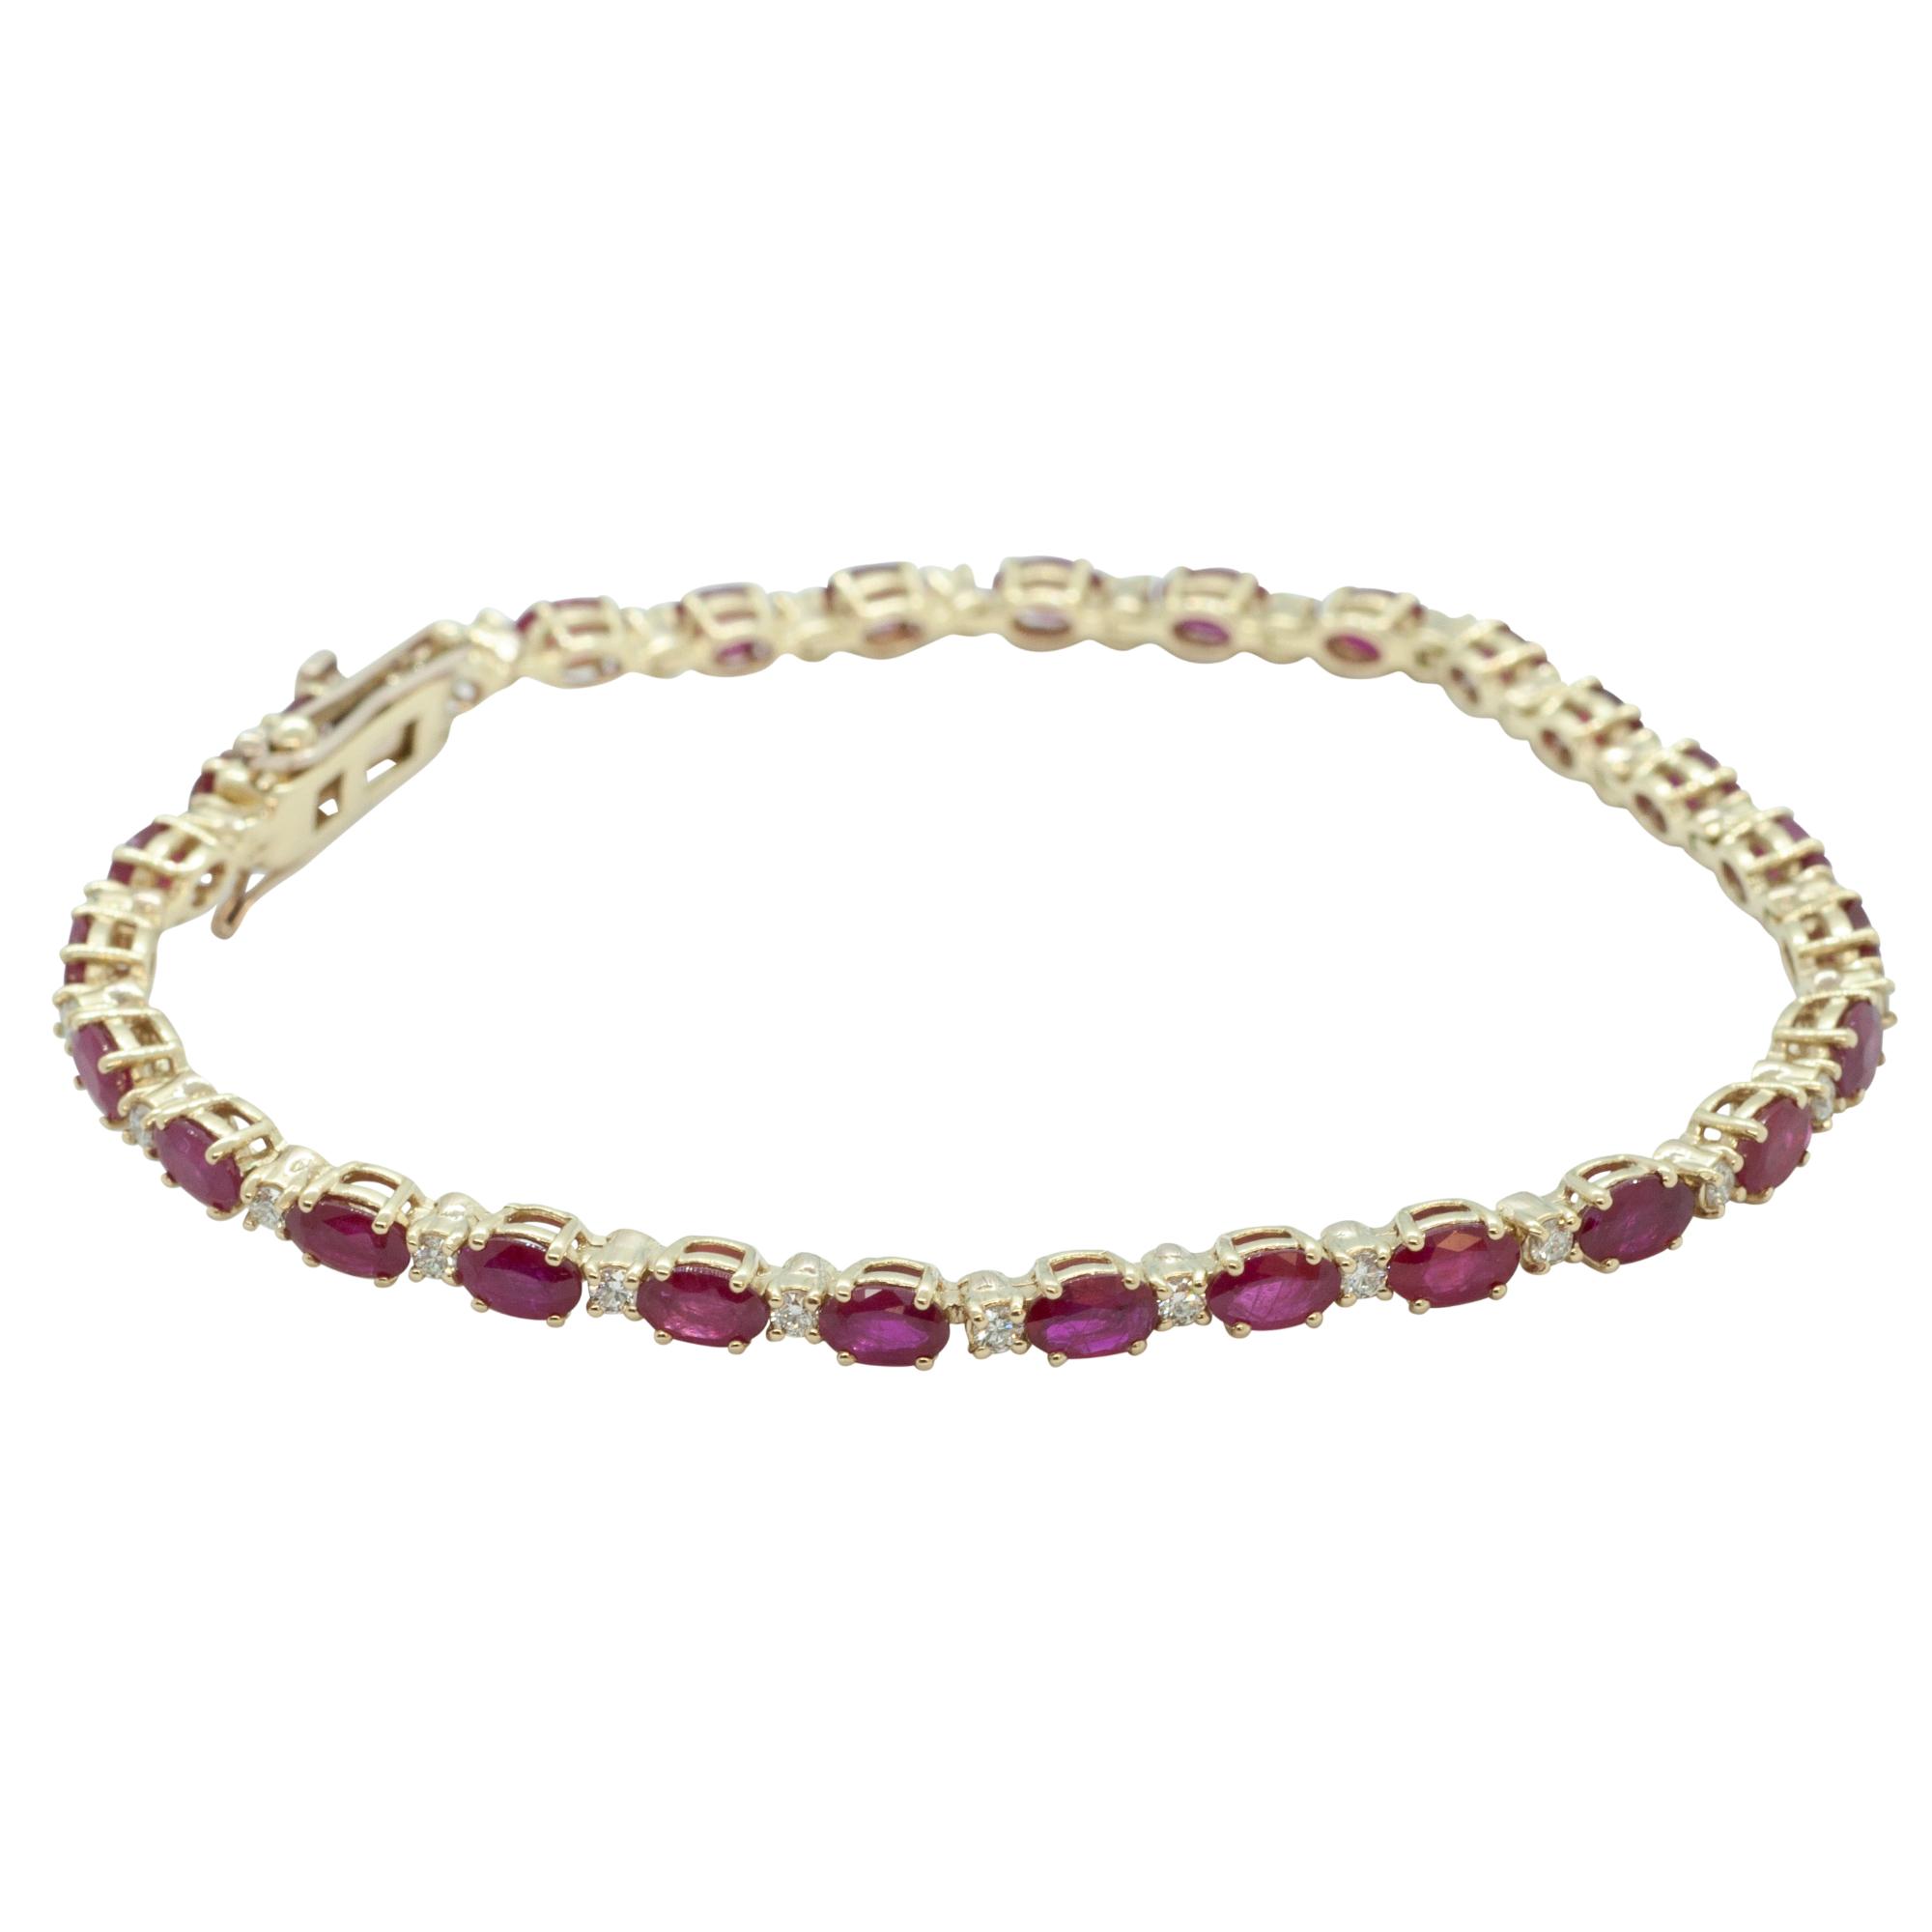 Oval Cut Ruby & Diamond 18ct Yellow Gold Bracelet